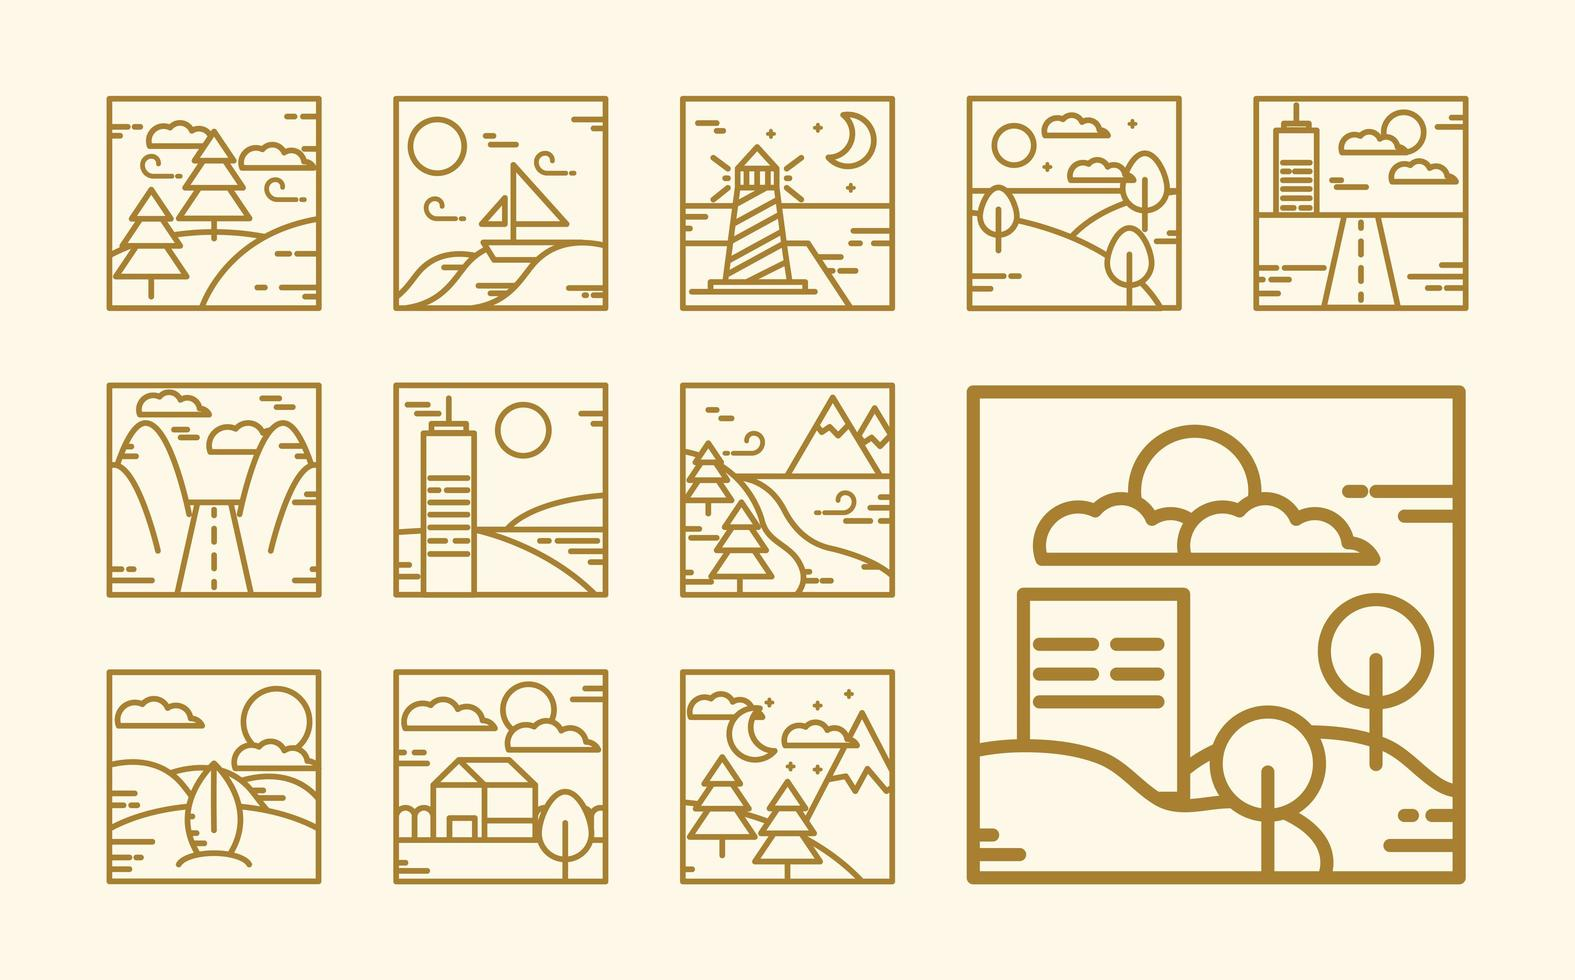 Square landscape outline icon collection vector